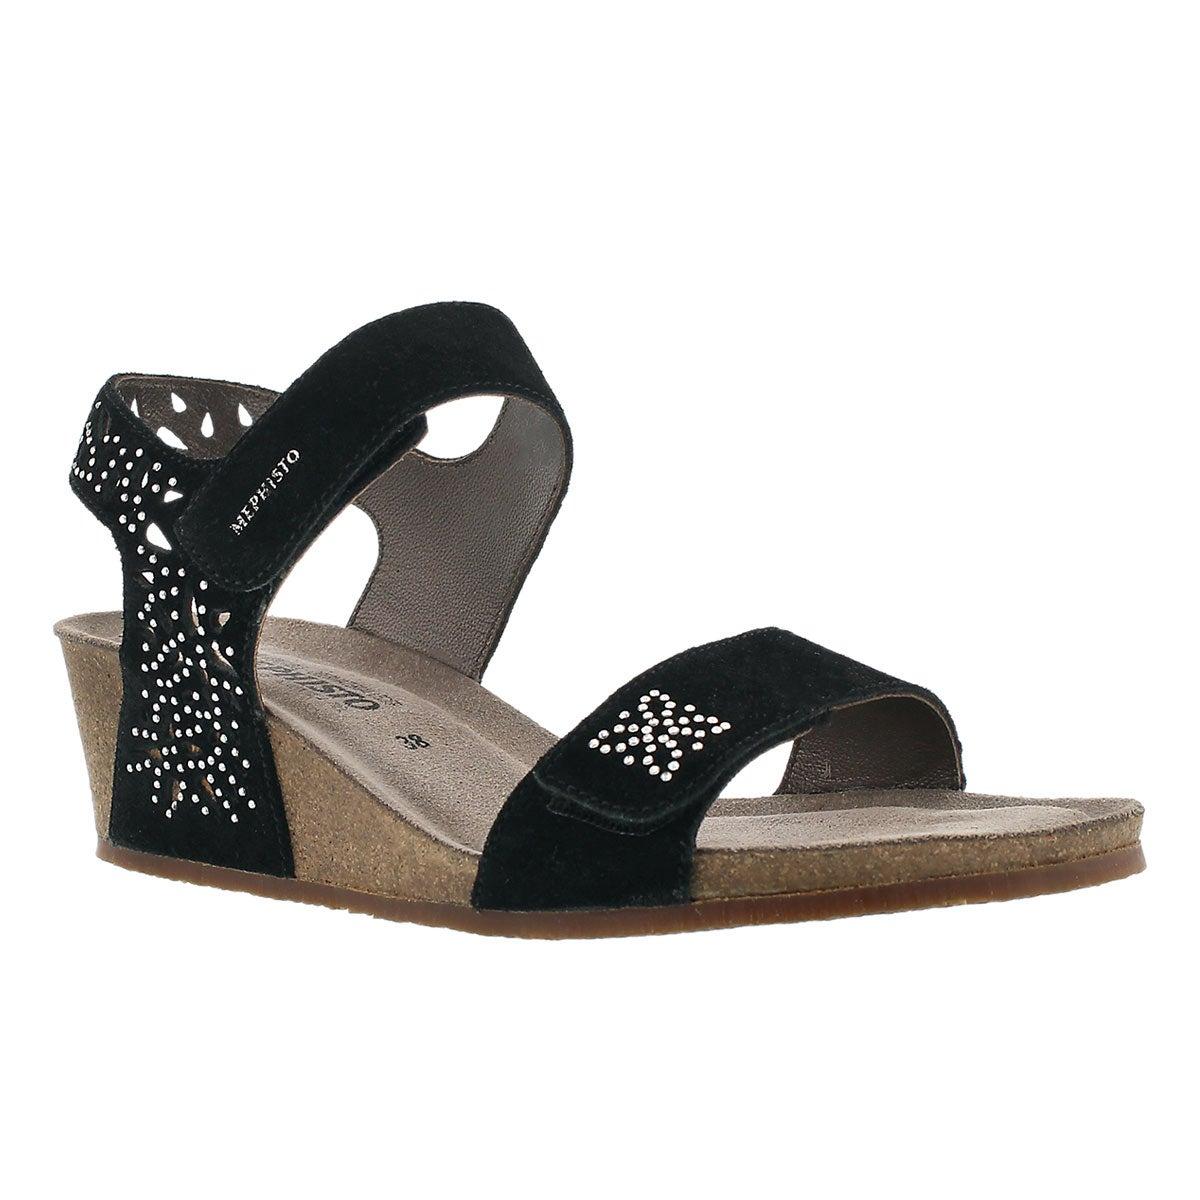 Women's MARIE SPARKLING black wedge sandals